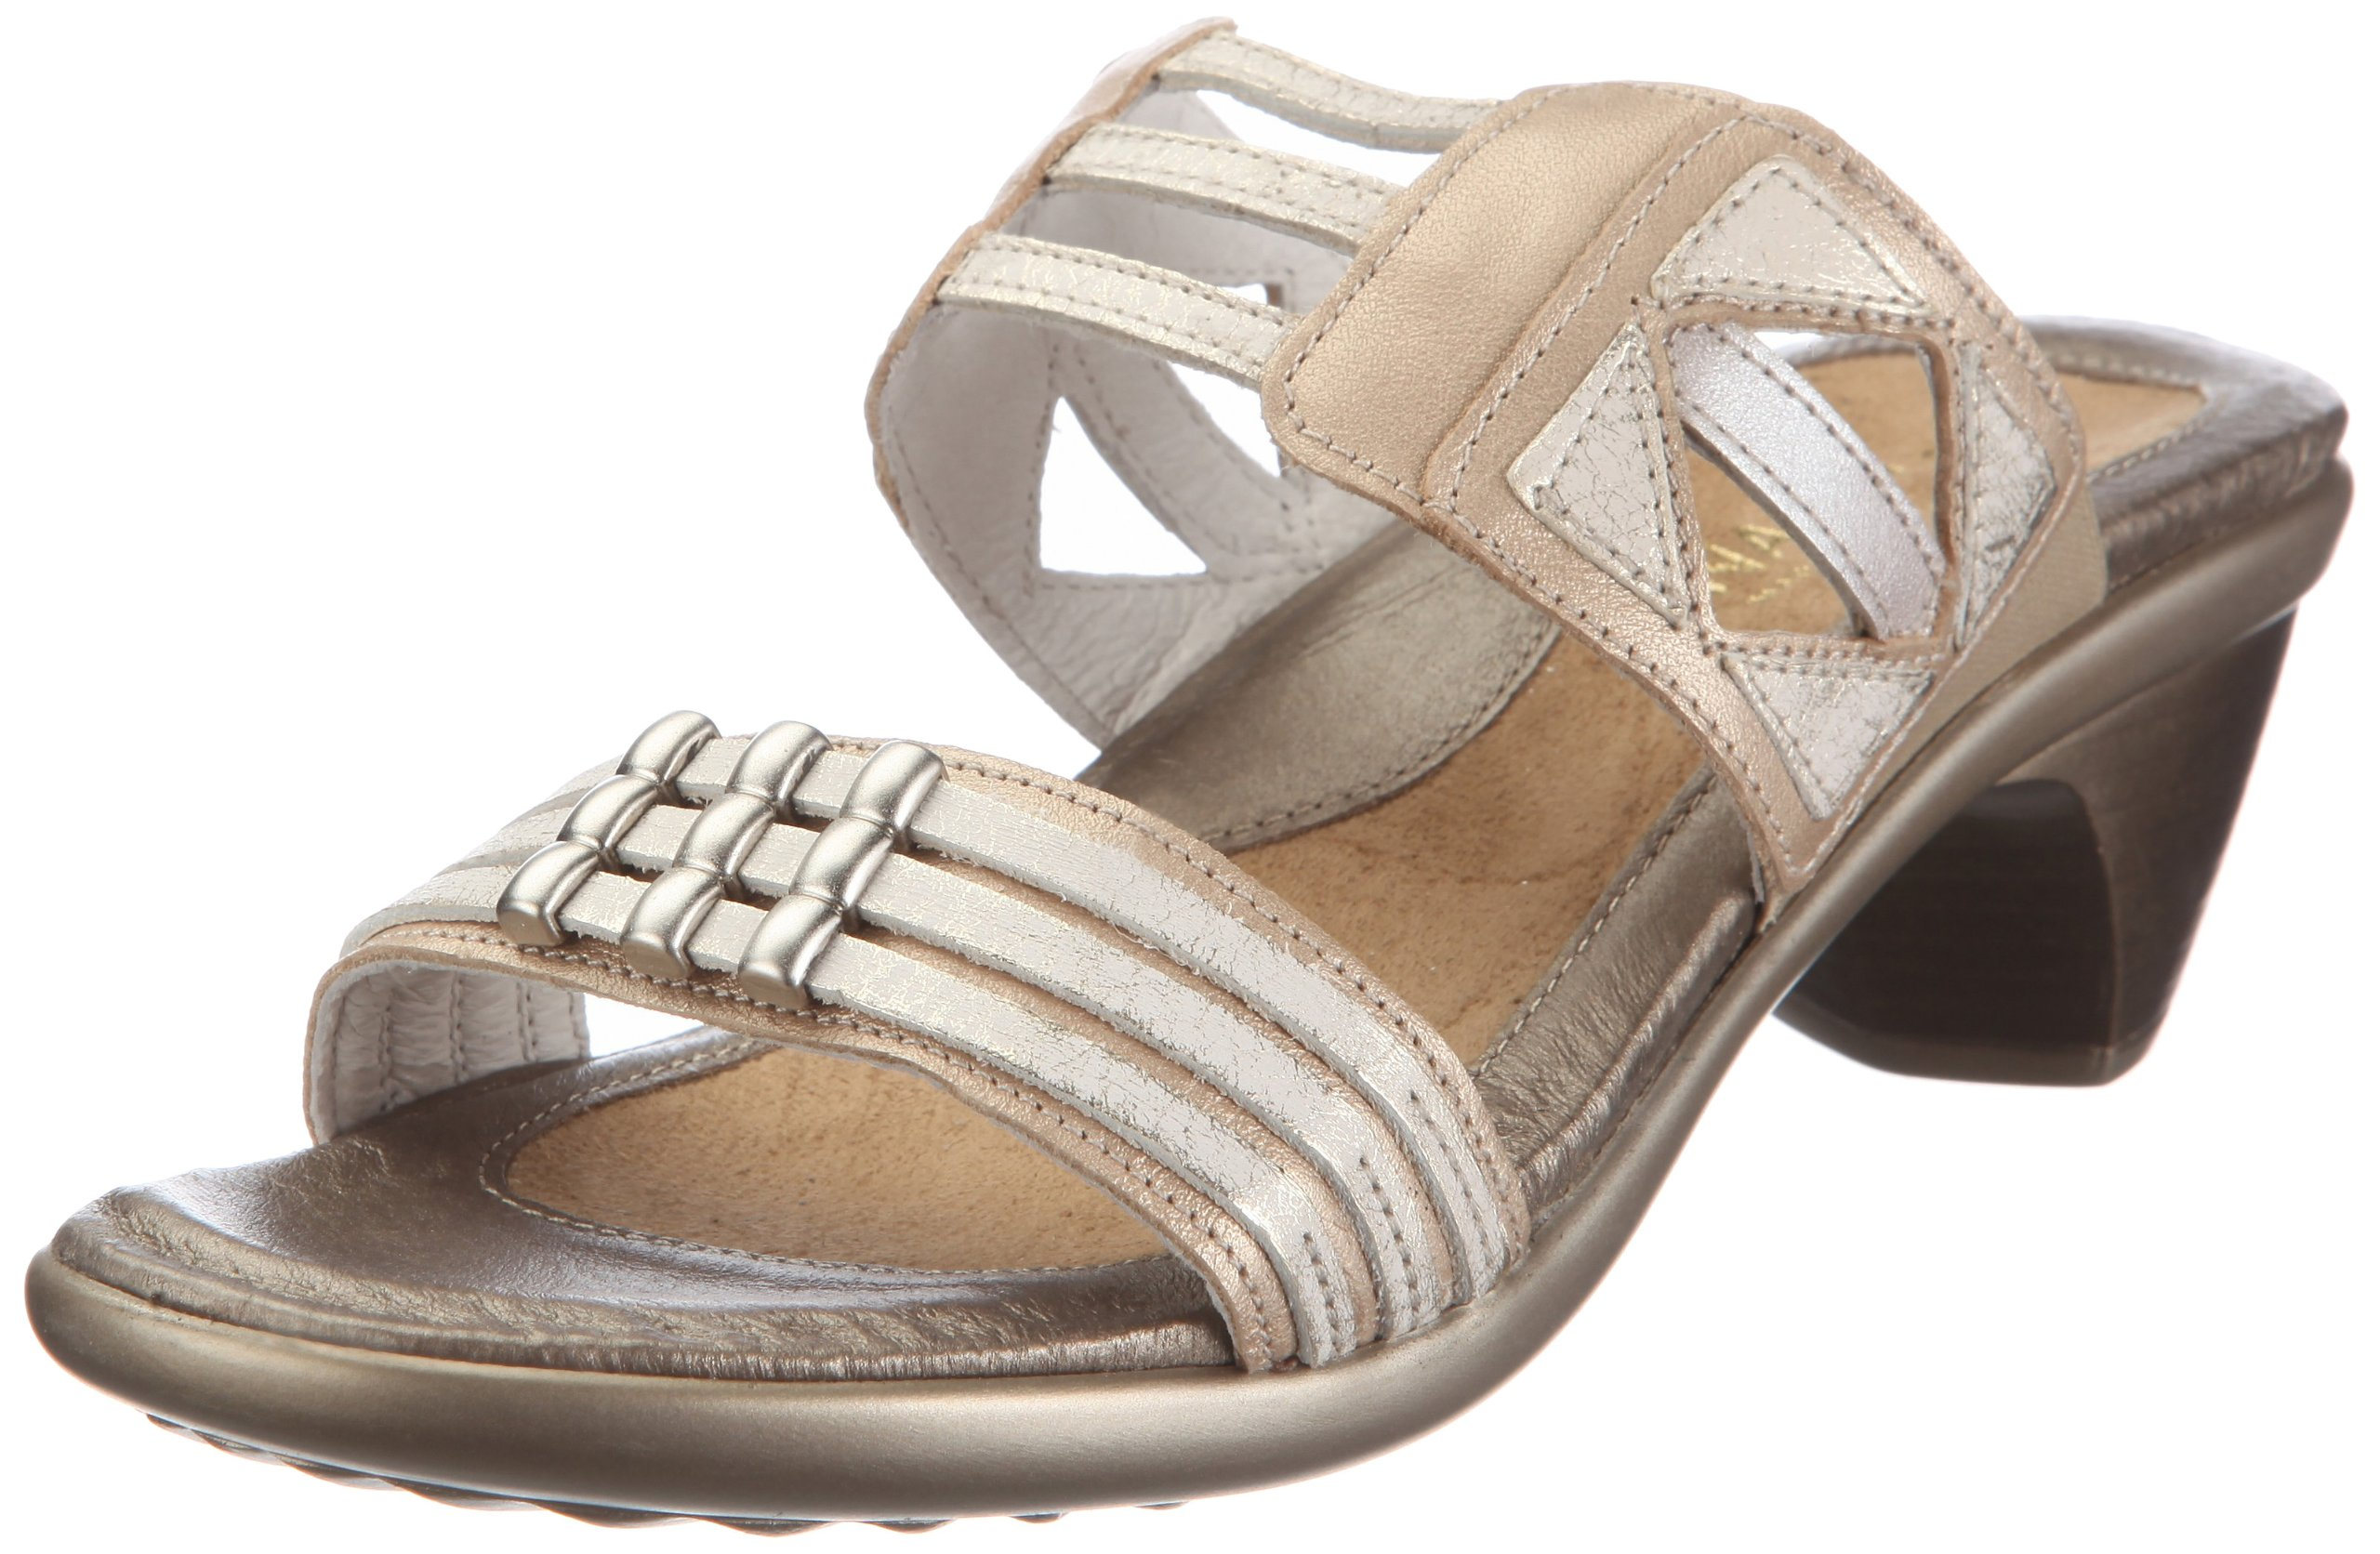 Naot Women's Afrodita Dress Sandal,Champagne Leather/Dusty Silver Leather/Quartz Leather,41 EU/9.5-10 M US